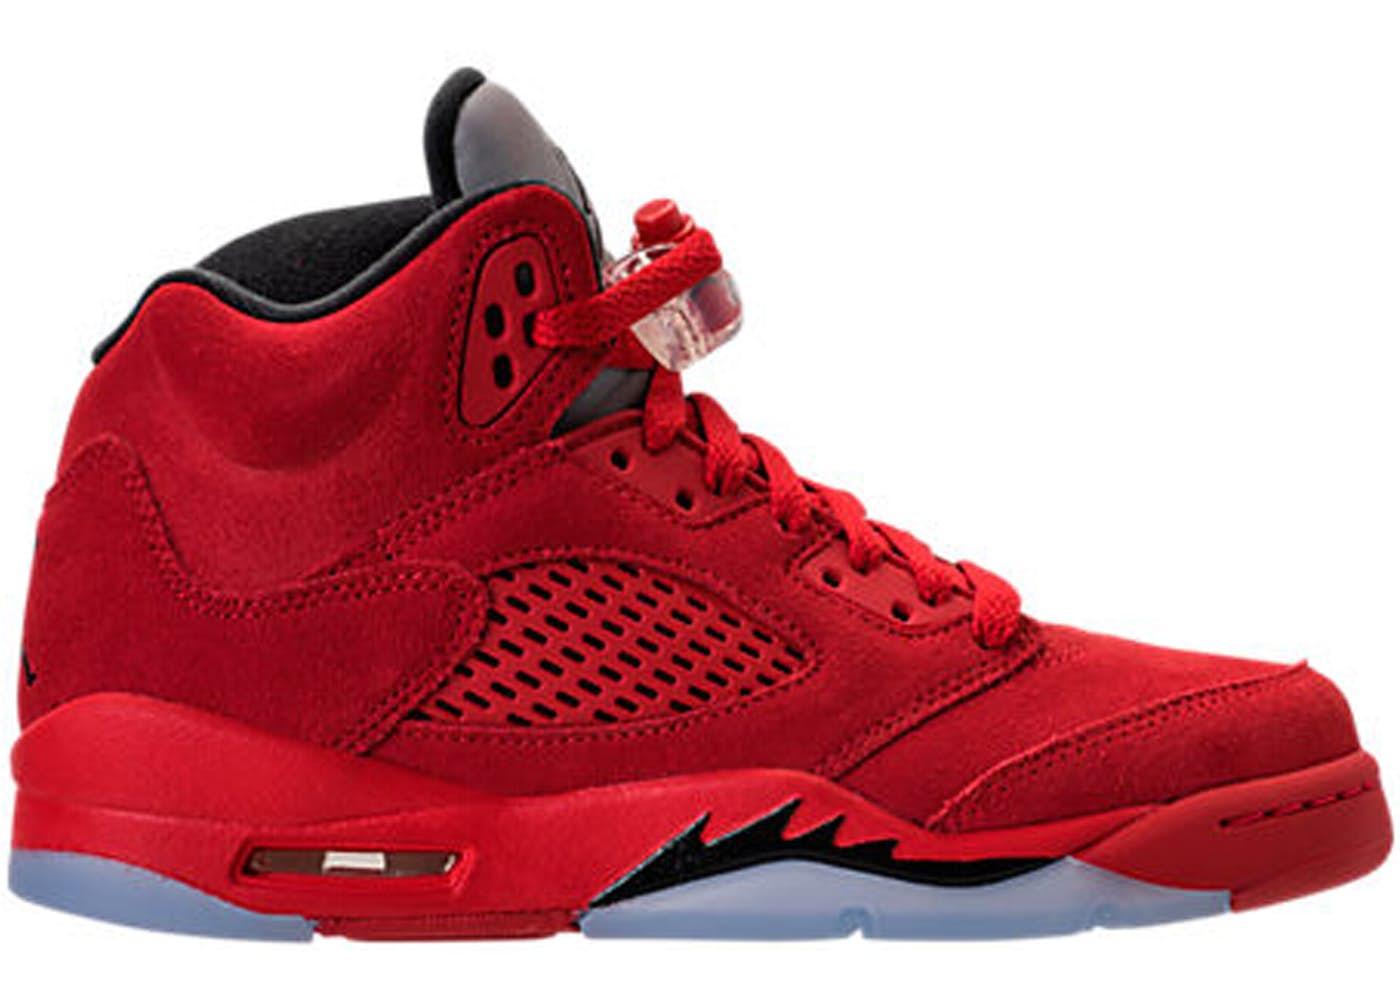 Jordan Retro Shoes For Sale Philippines